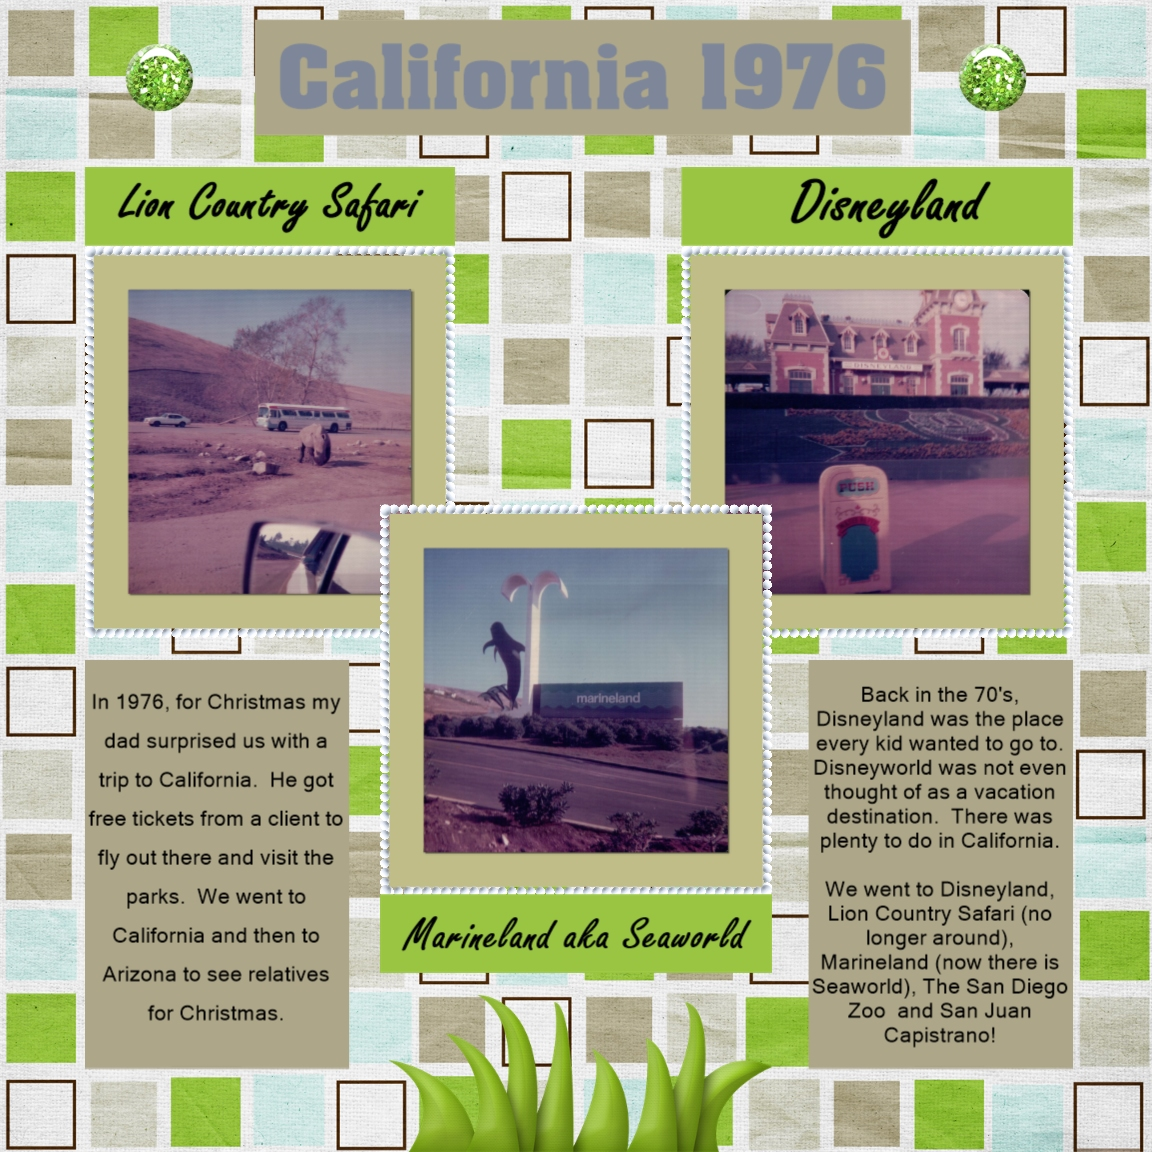 California 1976.jpg